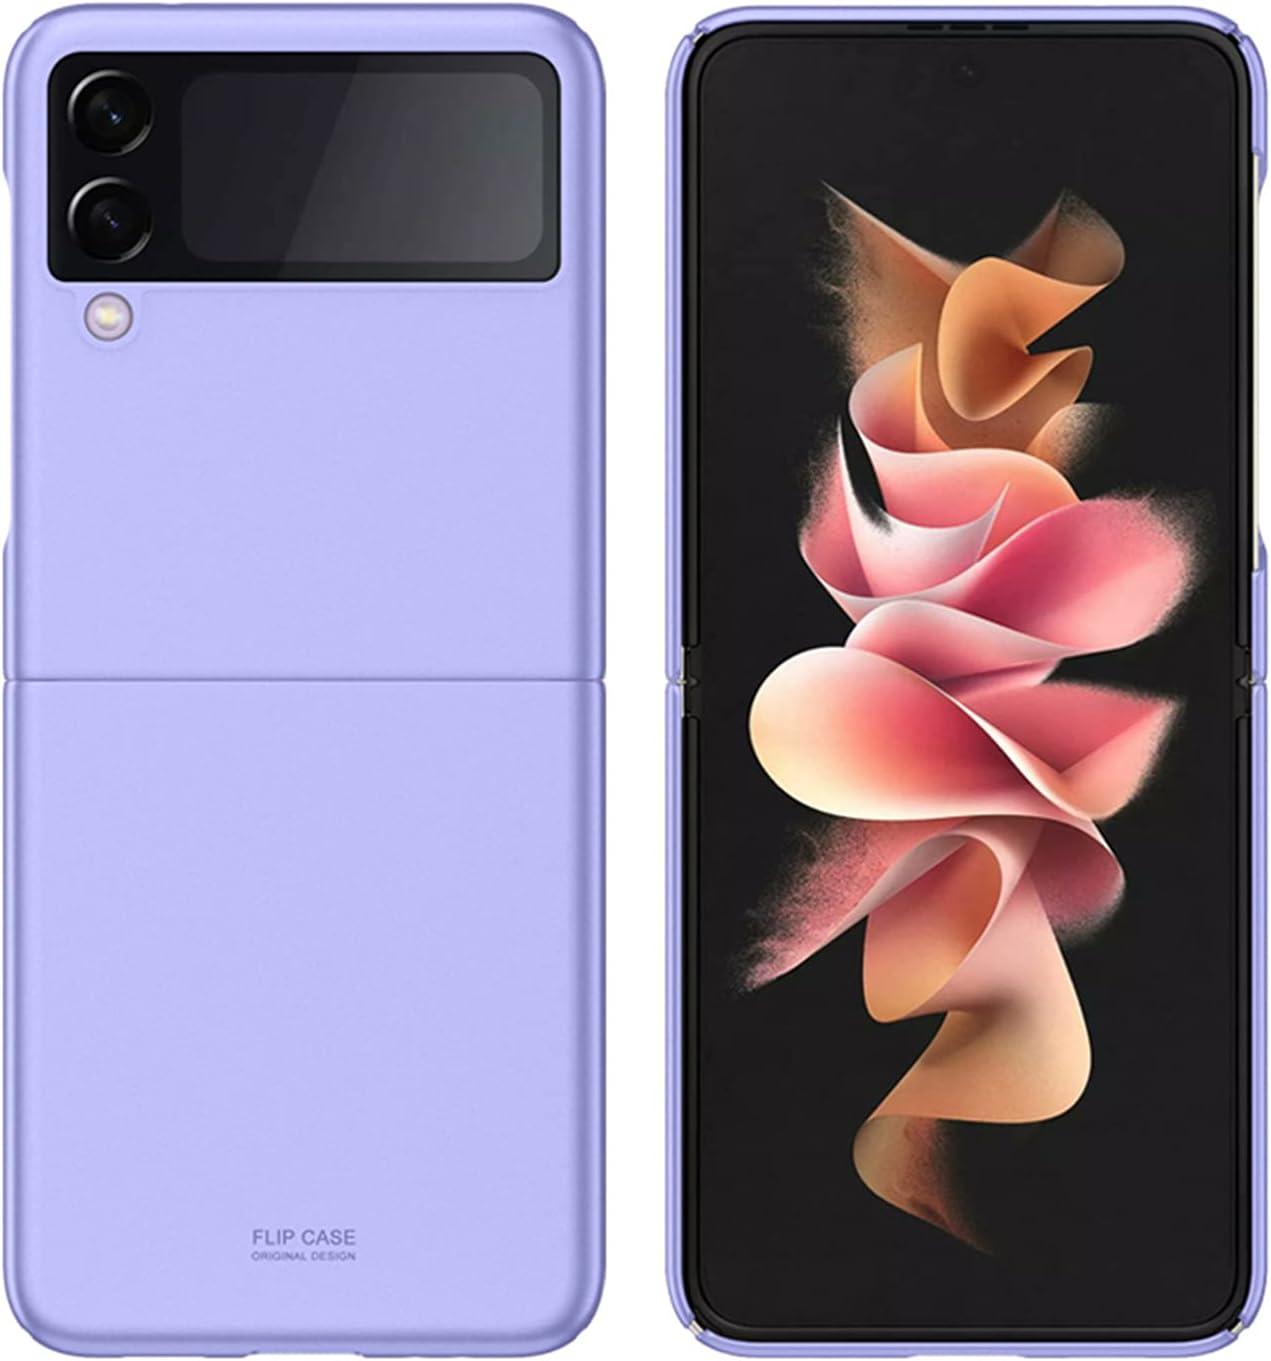 Z Flip 3 5G Case,DAMONDY Case for Galaxy Z Flip 3 5G,Thin Premium Hard Plastic Matte Finish Anti-Scratch Cover Cases for Samsung Galaxy Z Flip 3 2021 -Purple